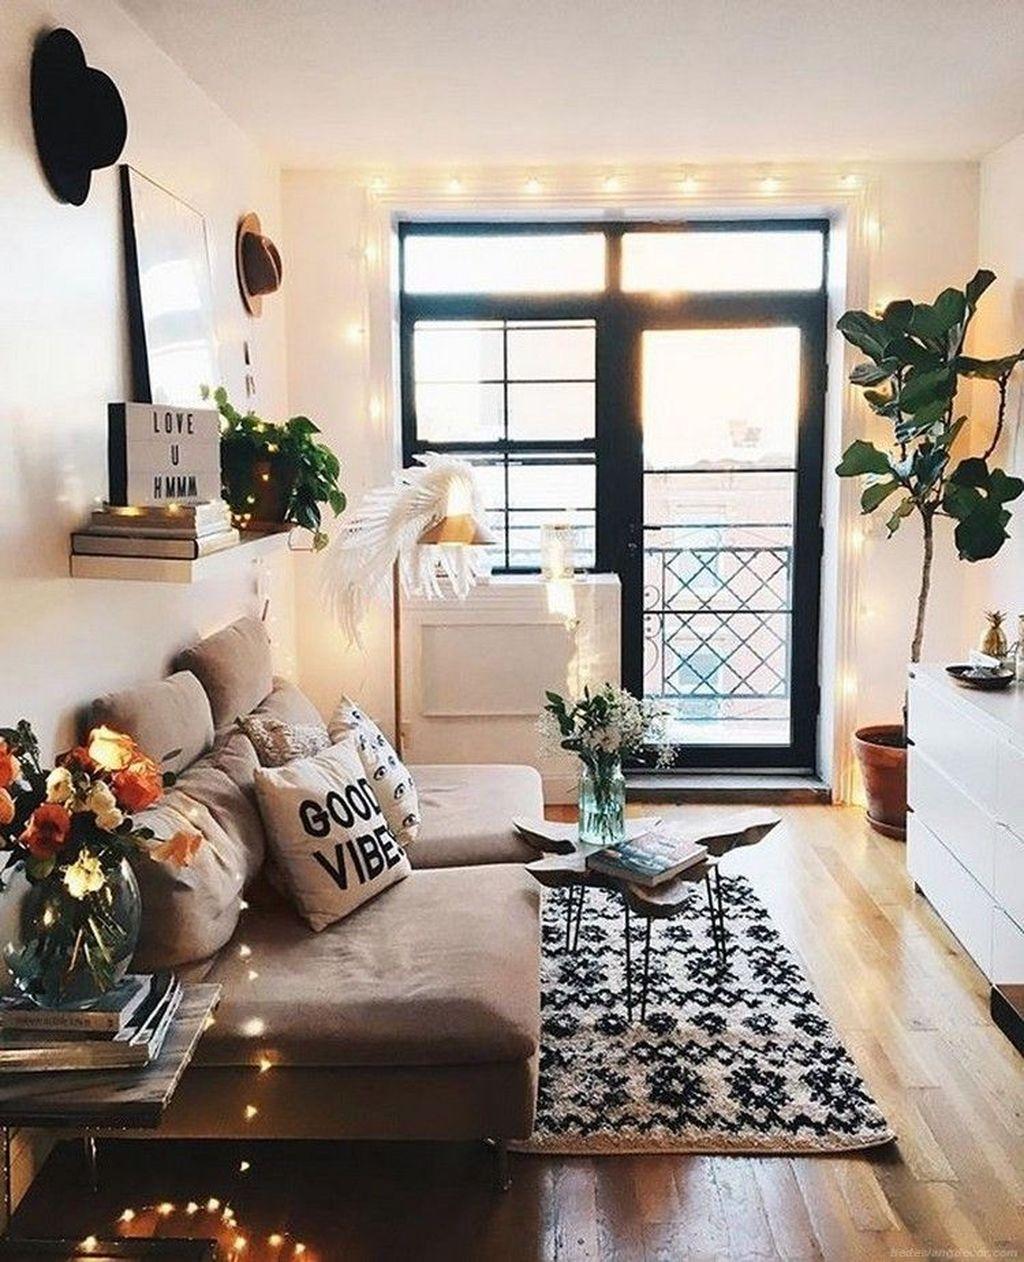 34 The Best Rustic Bohemian Living Room Decor Ideas Homyhomee Living Room Decor Apartment Small Apartment Living Room Small Living Room Decor